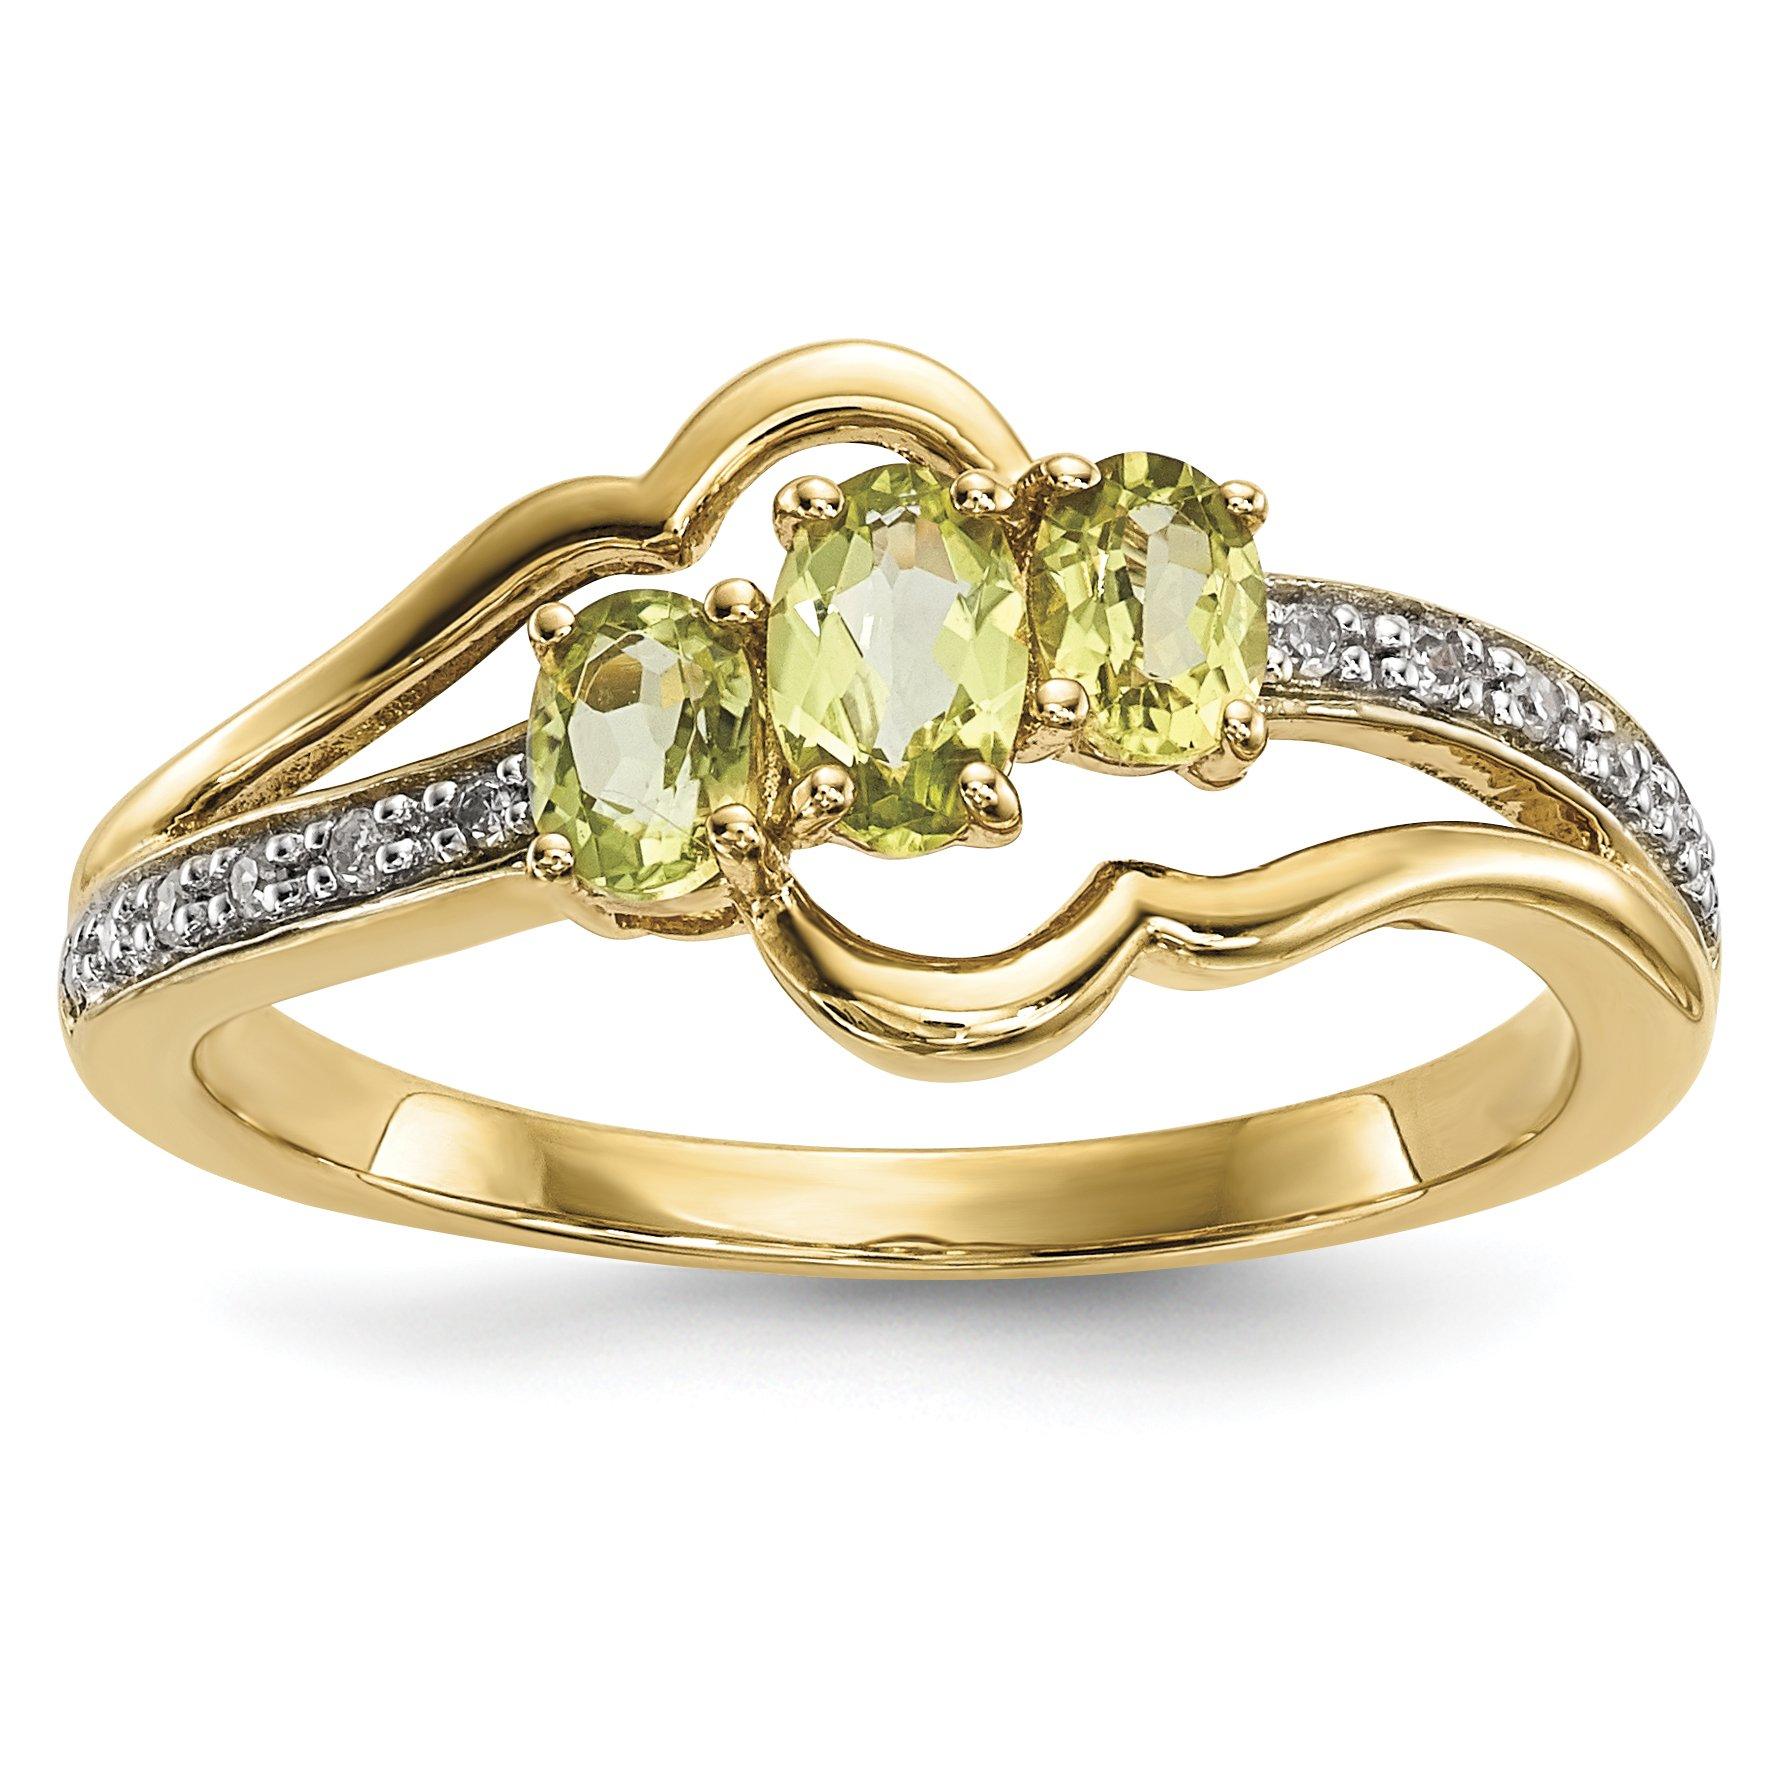 ICE CARATS 14k Yellow Gold Green Peridot Diamond Band Ring Size 7.00 Gemstone Fine Jewelry Gift Set For Women Heart